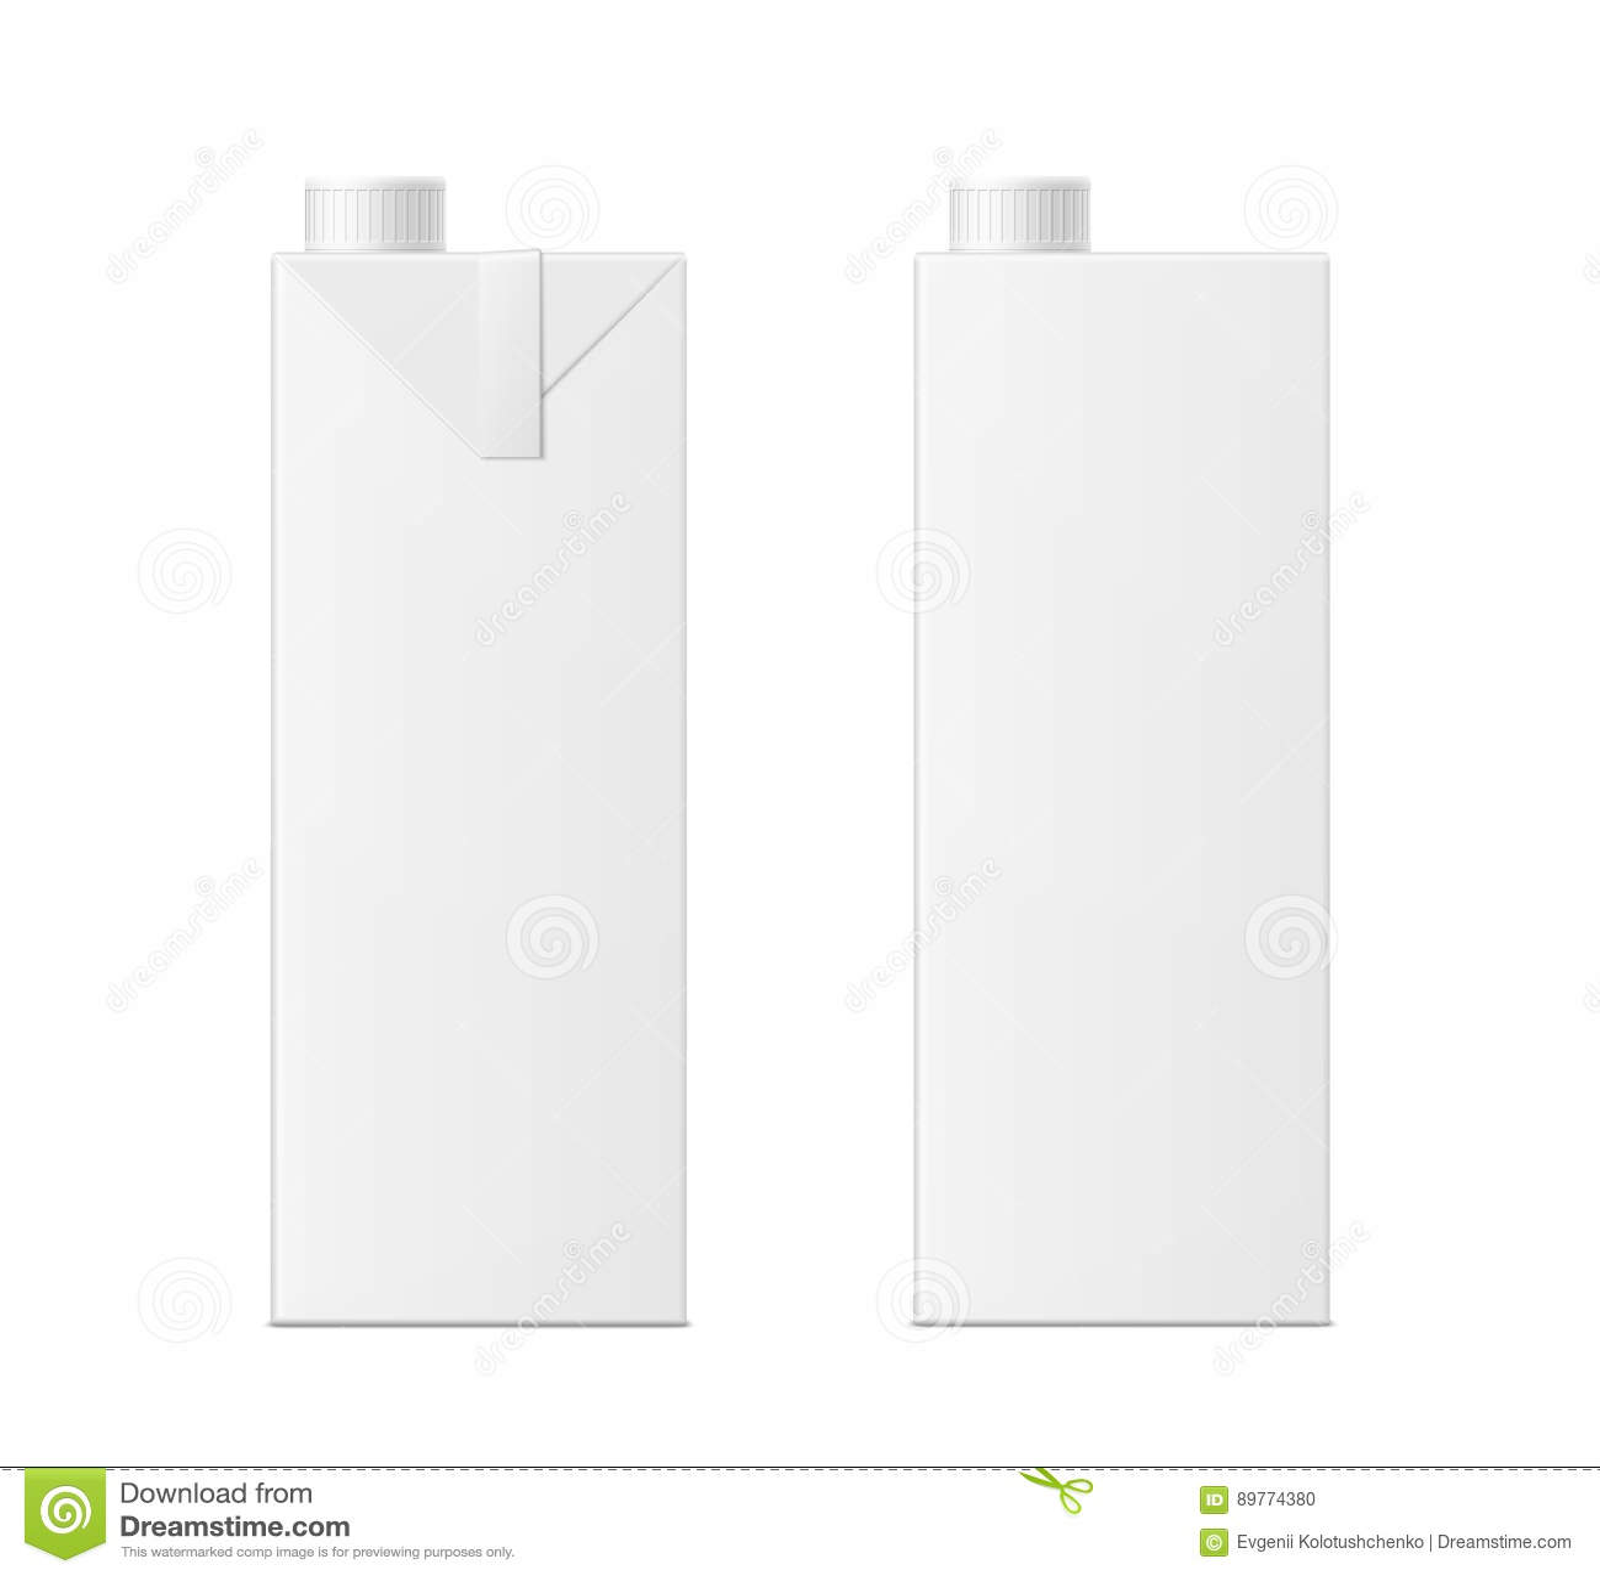 Juice box template vector